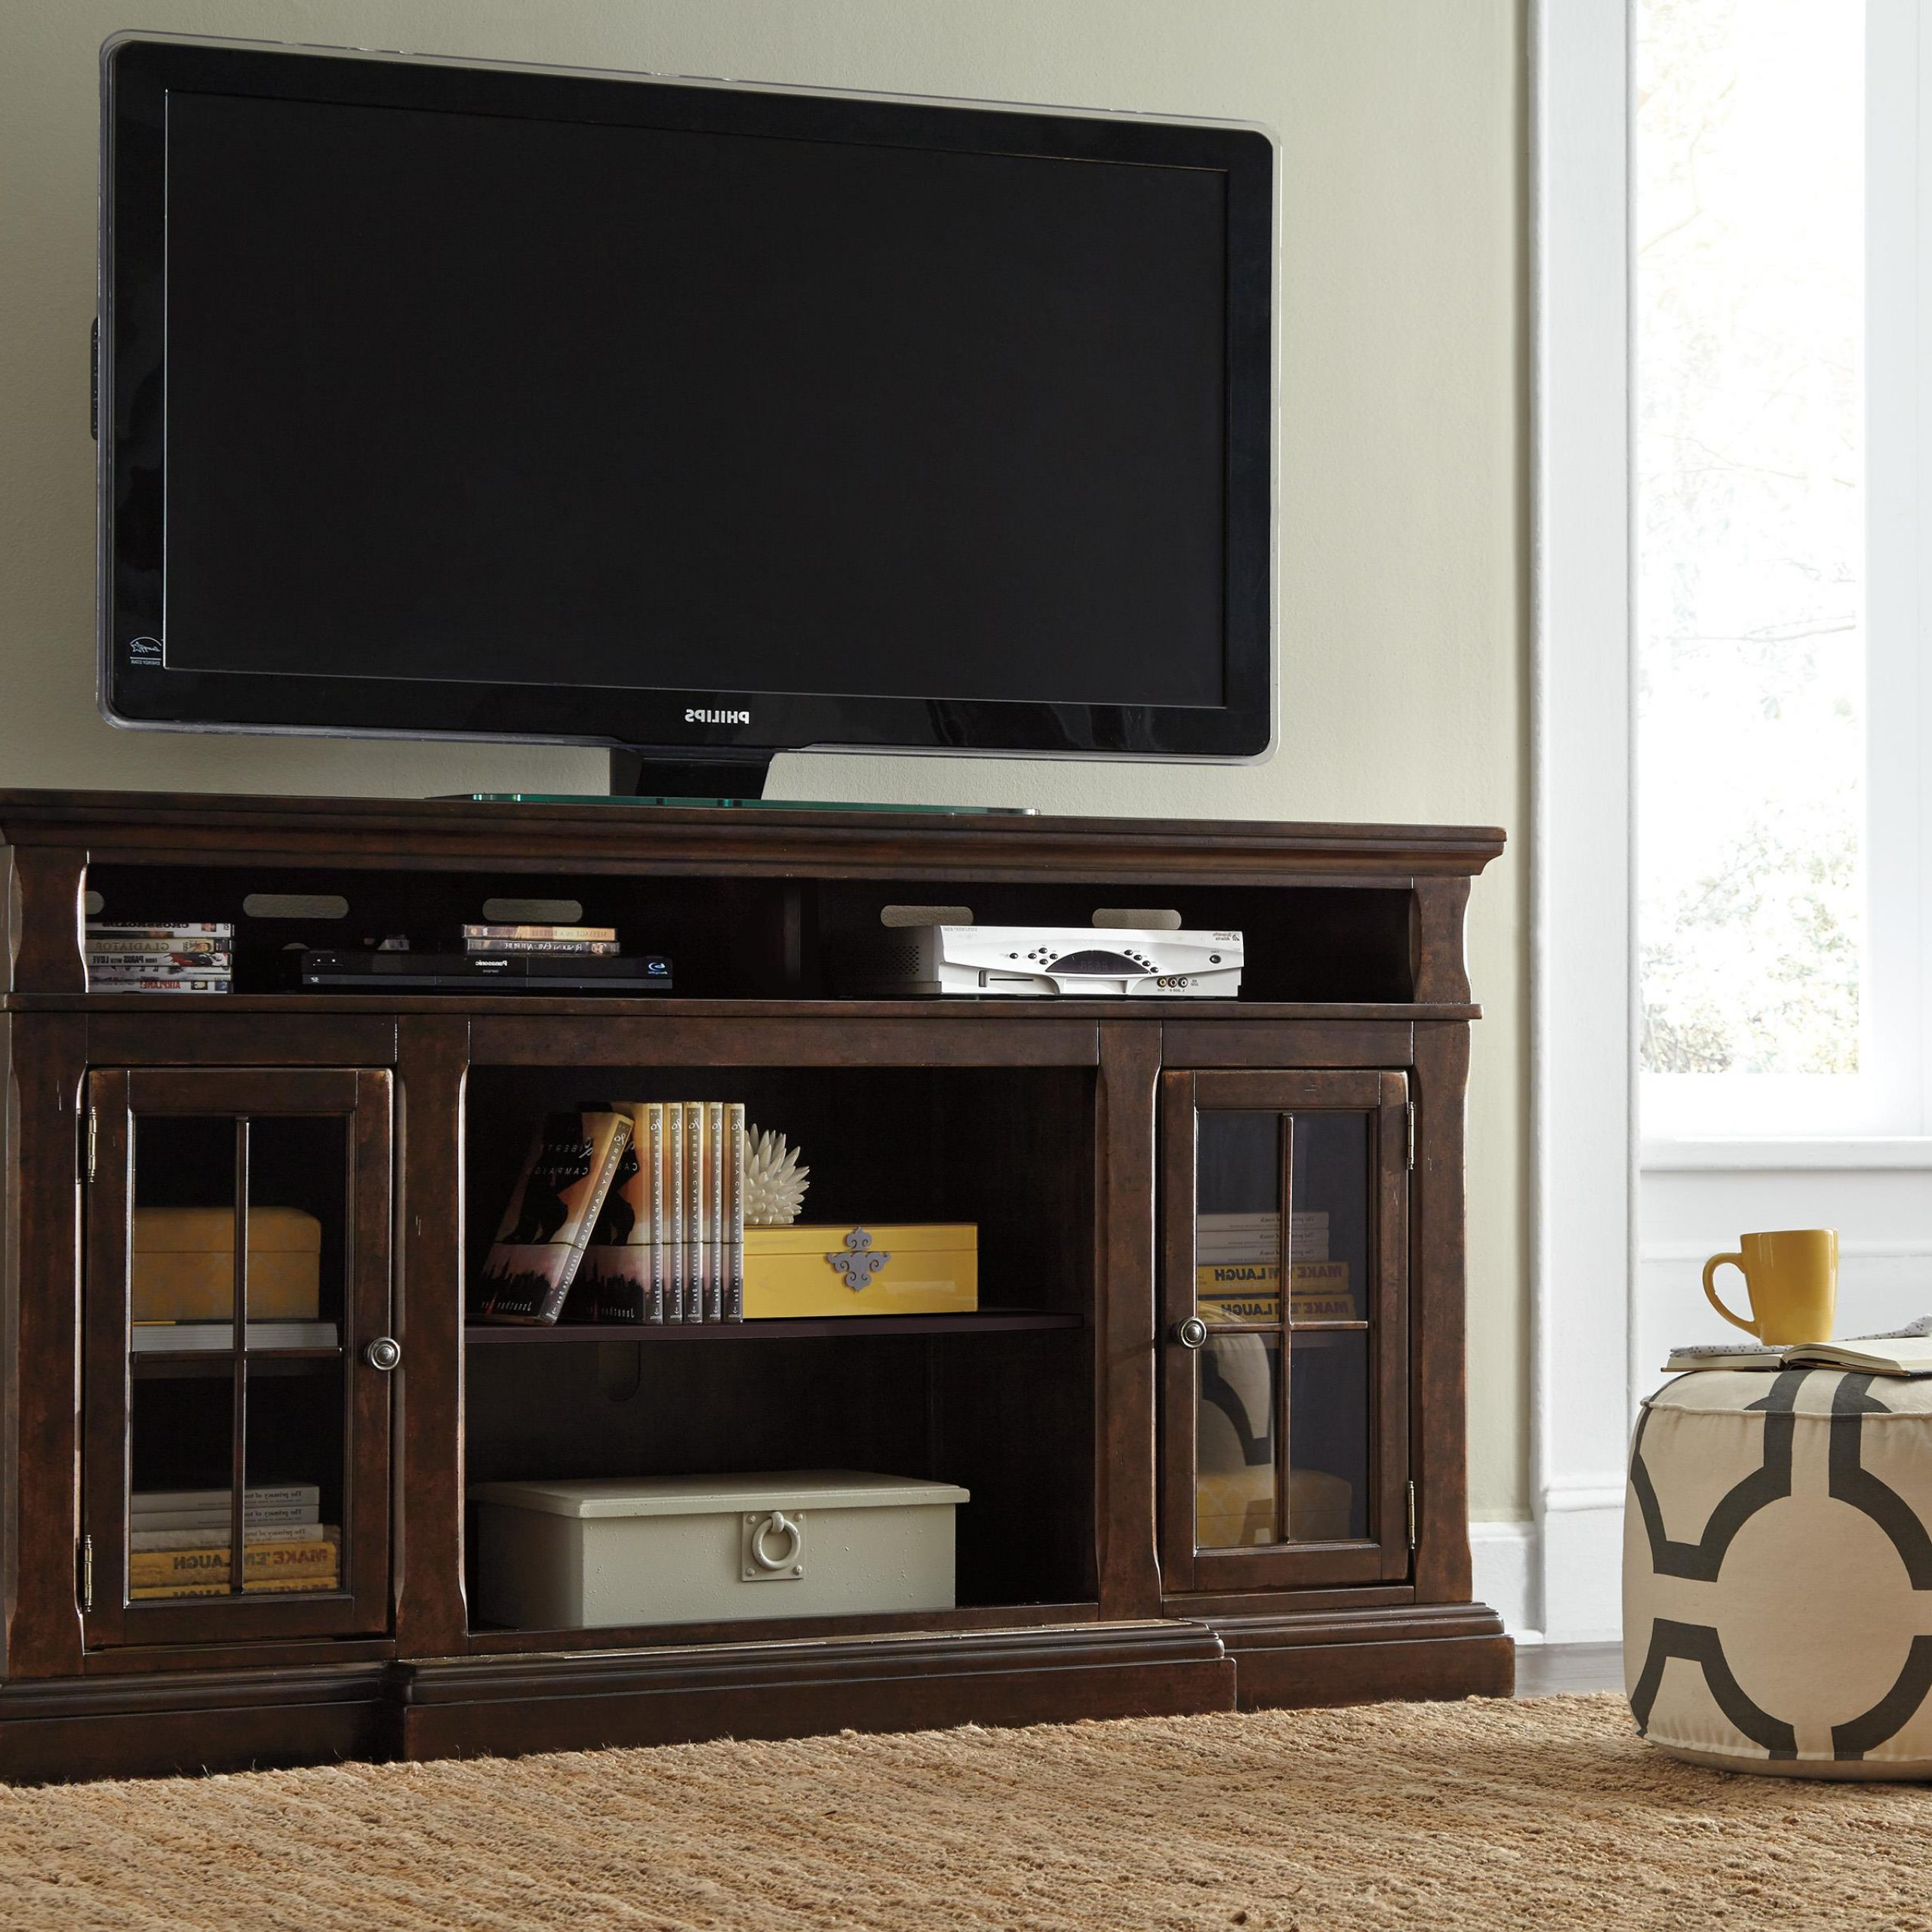 "Extra Large Tv Stand With Breakfront & 2 Glass Doors Regarding Glass Doors Corner Tv Stands For Tvs Upto 42"" (View 13 of 20)"